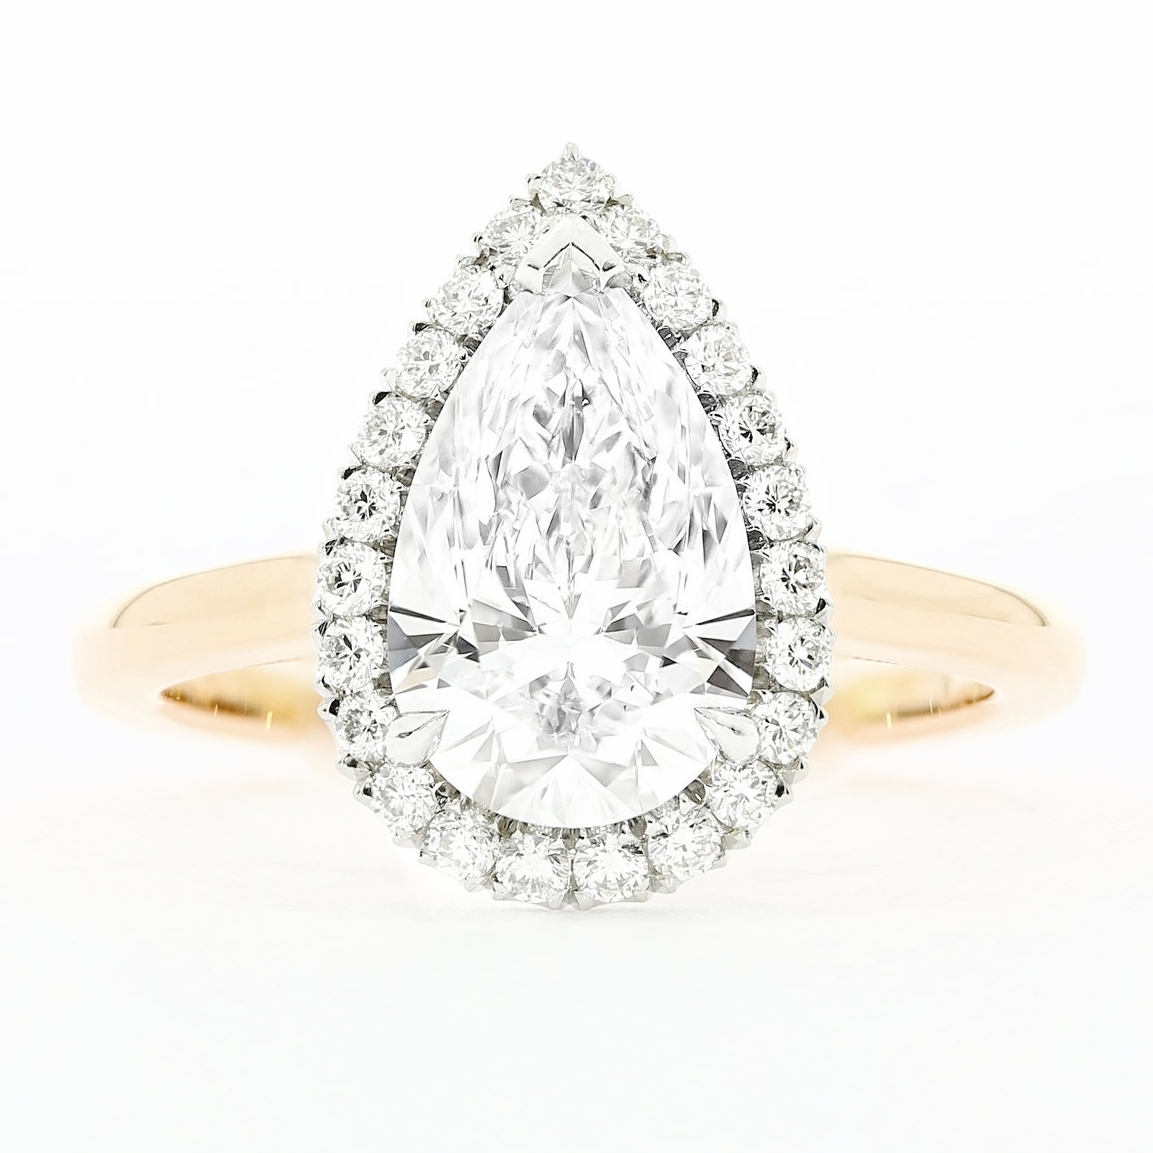 proposal-stories-ideas-pear-diamond-halo-rose-gold-engagement-ring-amazing-romantic-story-australia-beach-engagement-wedding-queensmith-master-jewellers-hatton-garden-london